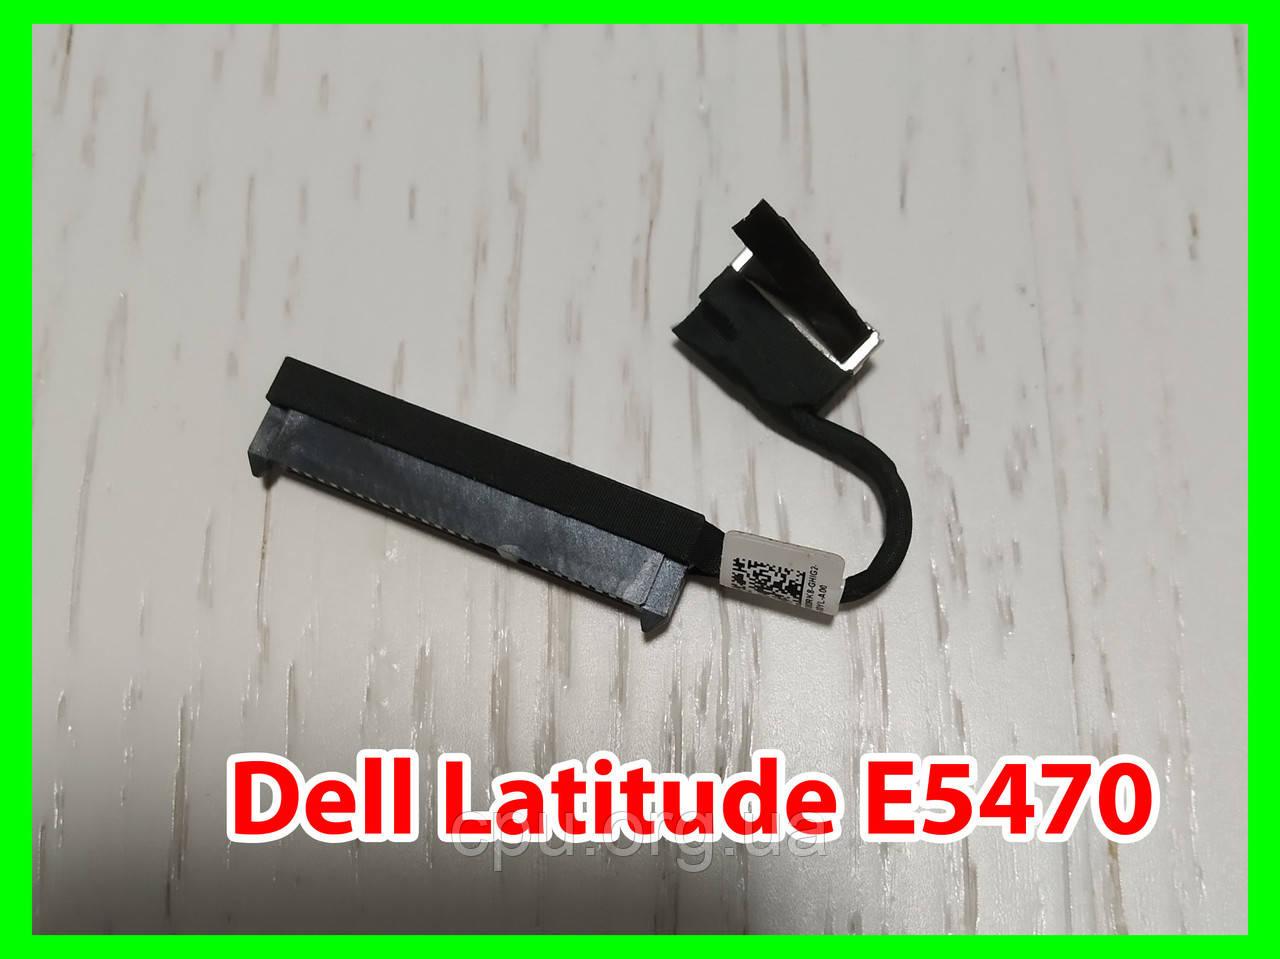 Dell Latitude E5470 кабель / шлейф накопителя